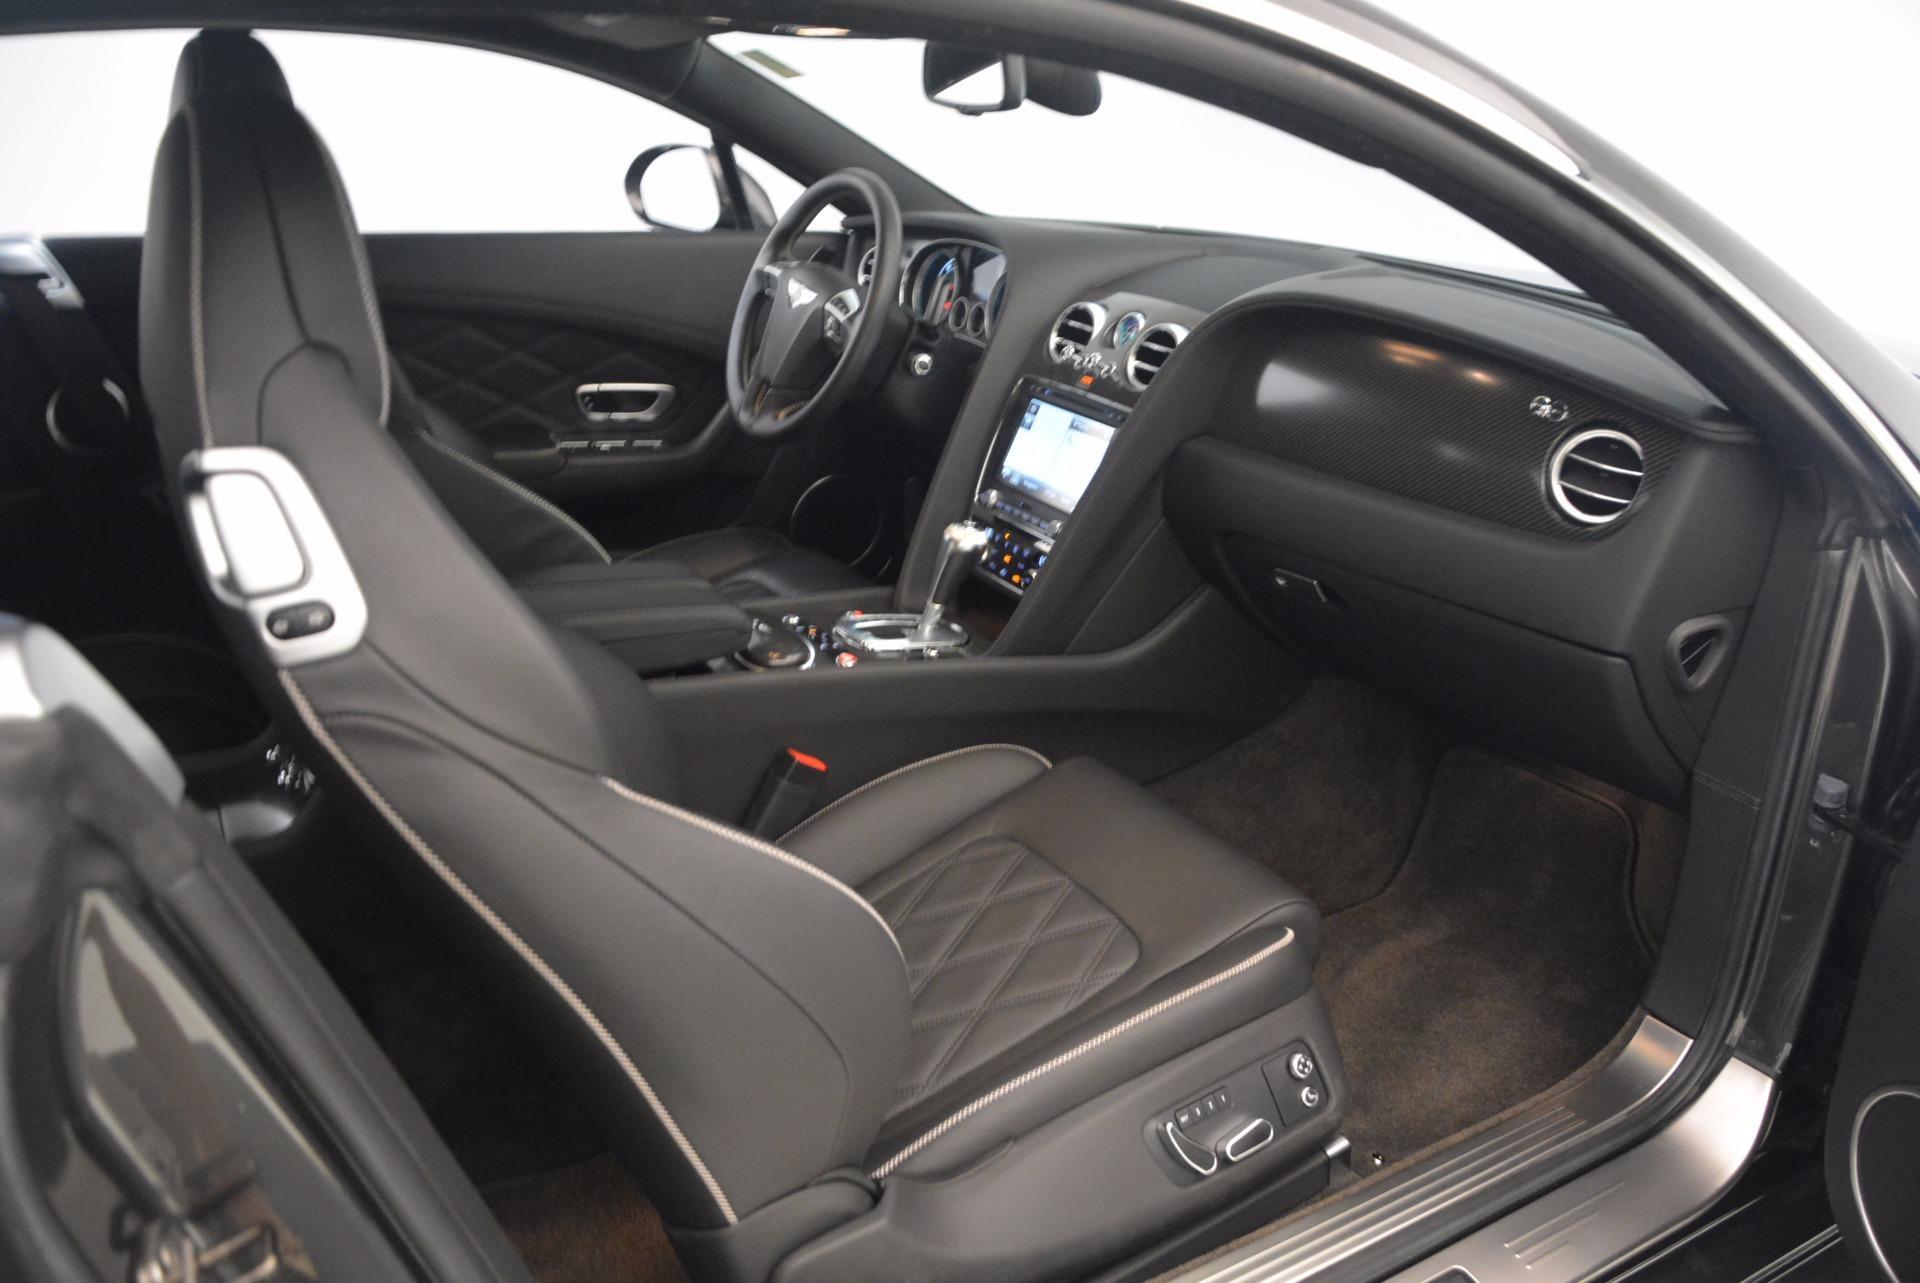 Used 2014 Bentley Continental GT Speed For Sale In Westport, CT 1473_p29